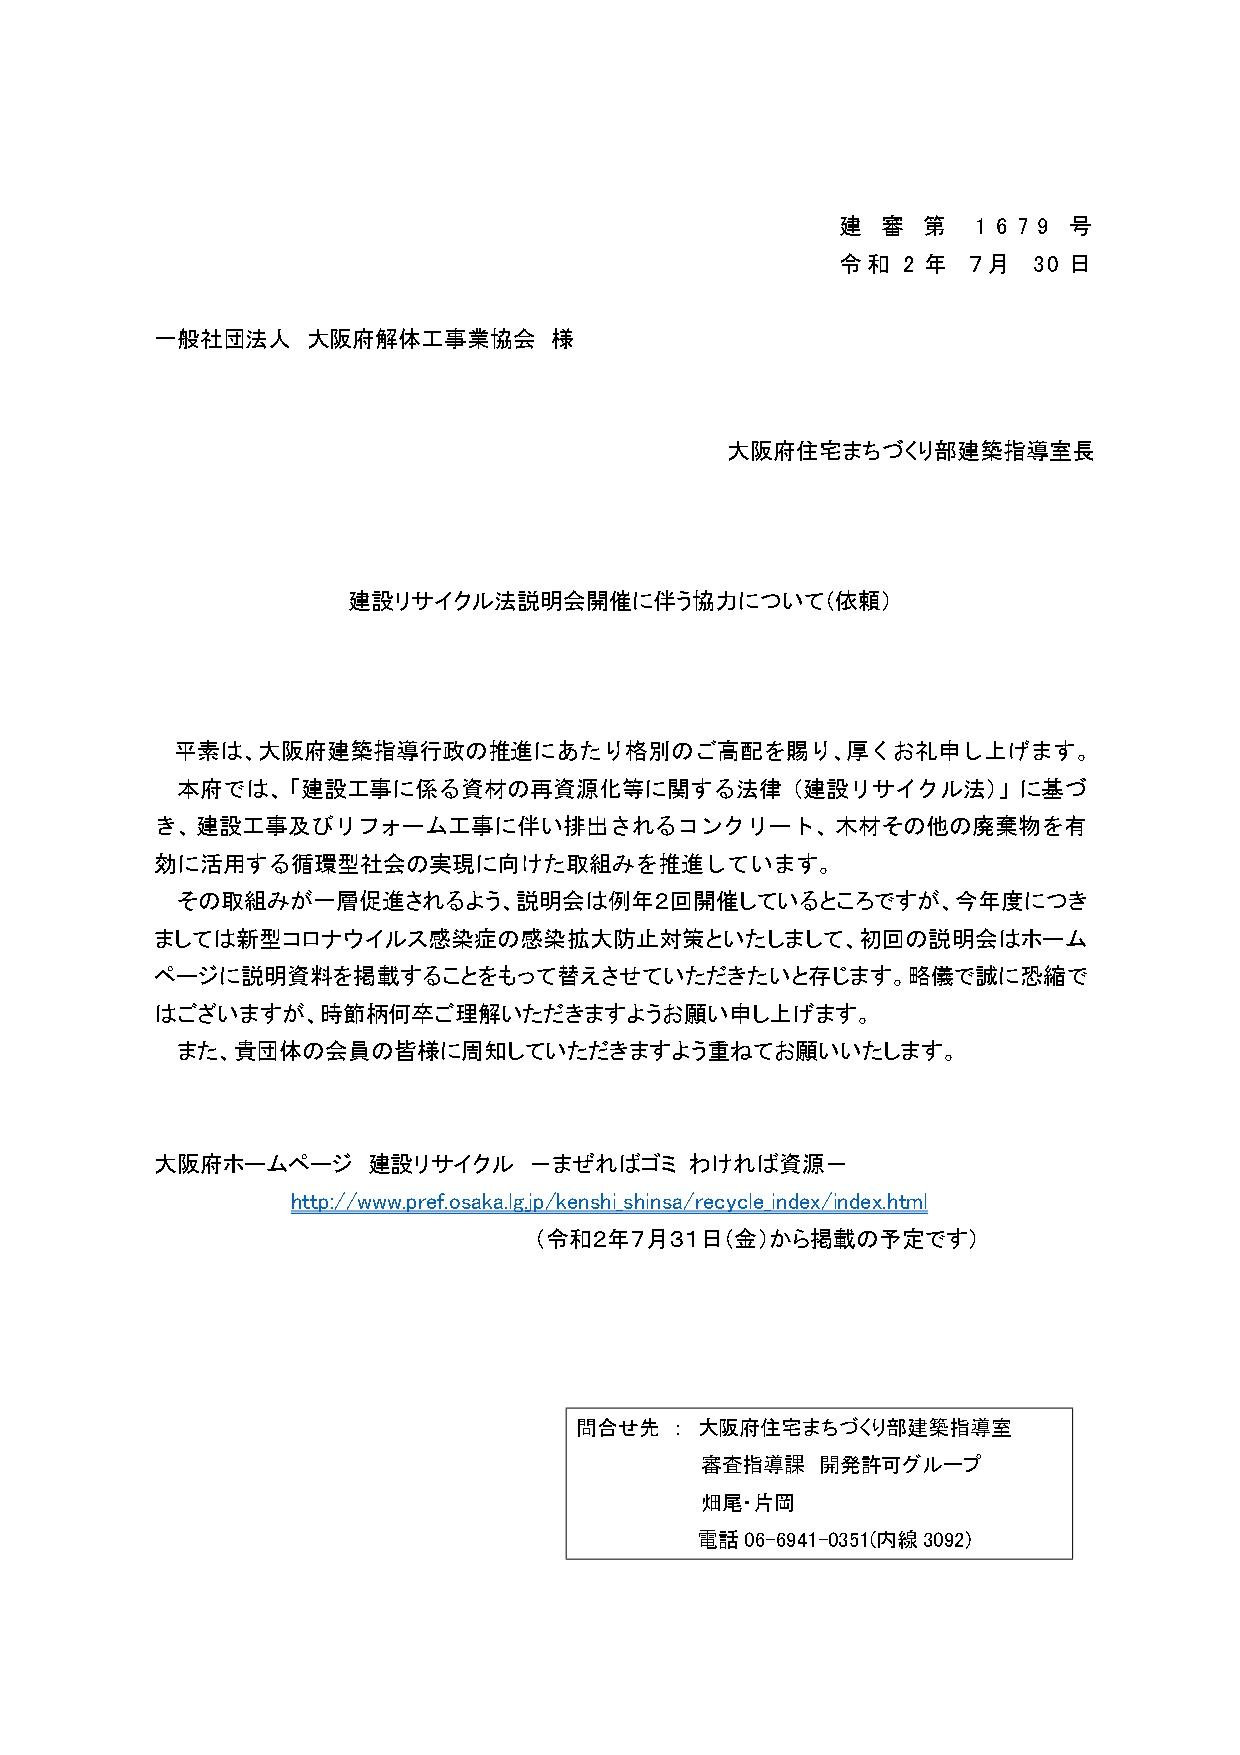 R2依頼文_page-0001